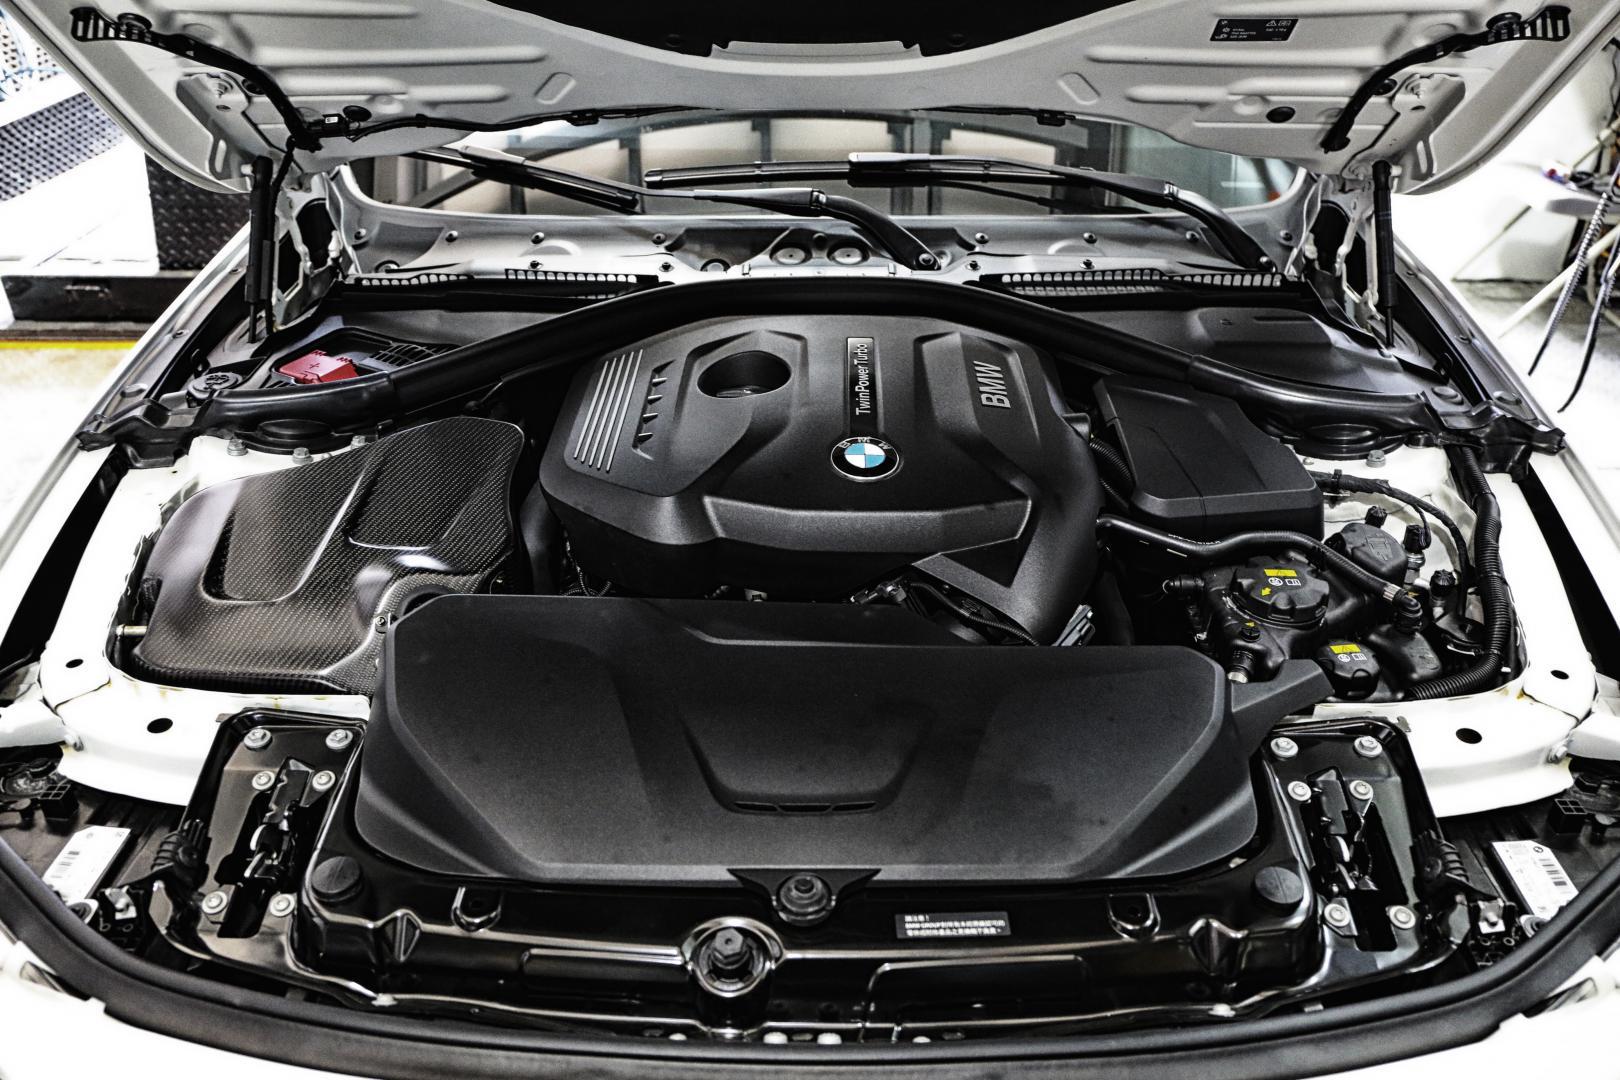 Subaru Dealers Ma >> BMW F30 330i Cold Carbon Intake - ARMA Speed